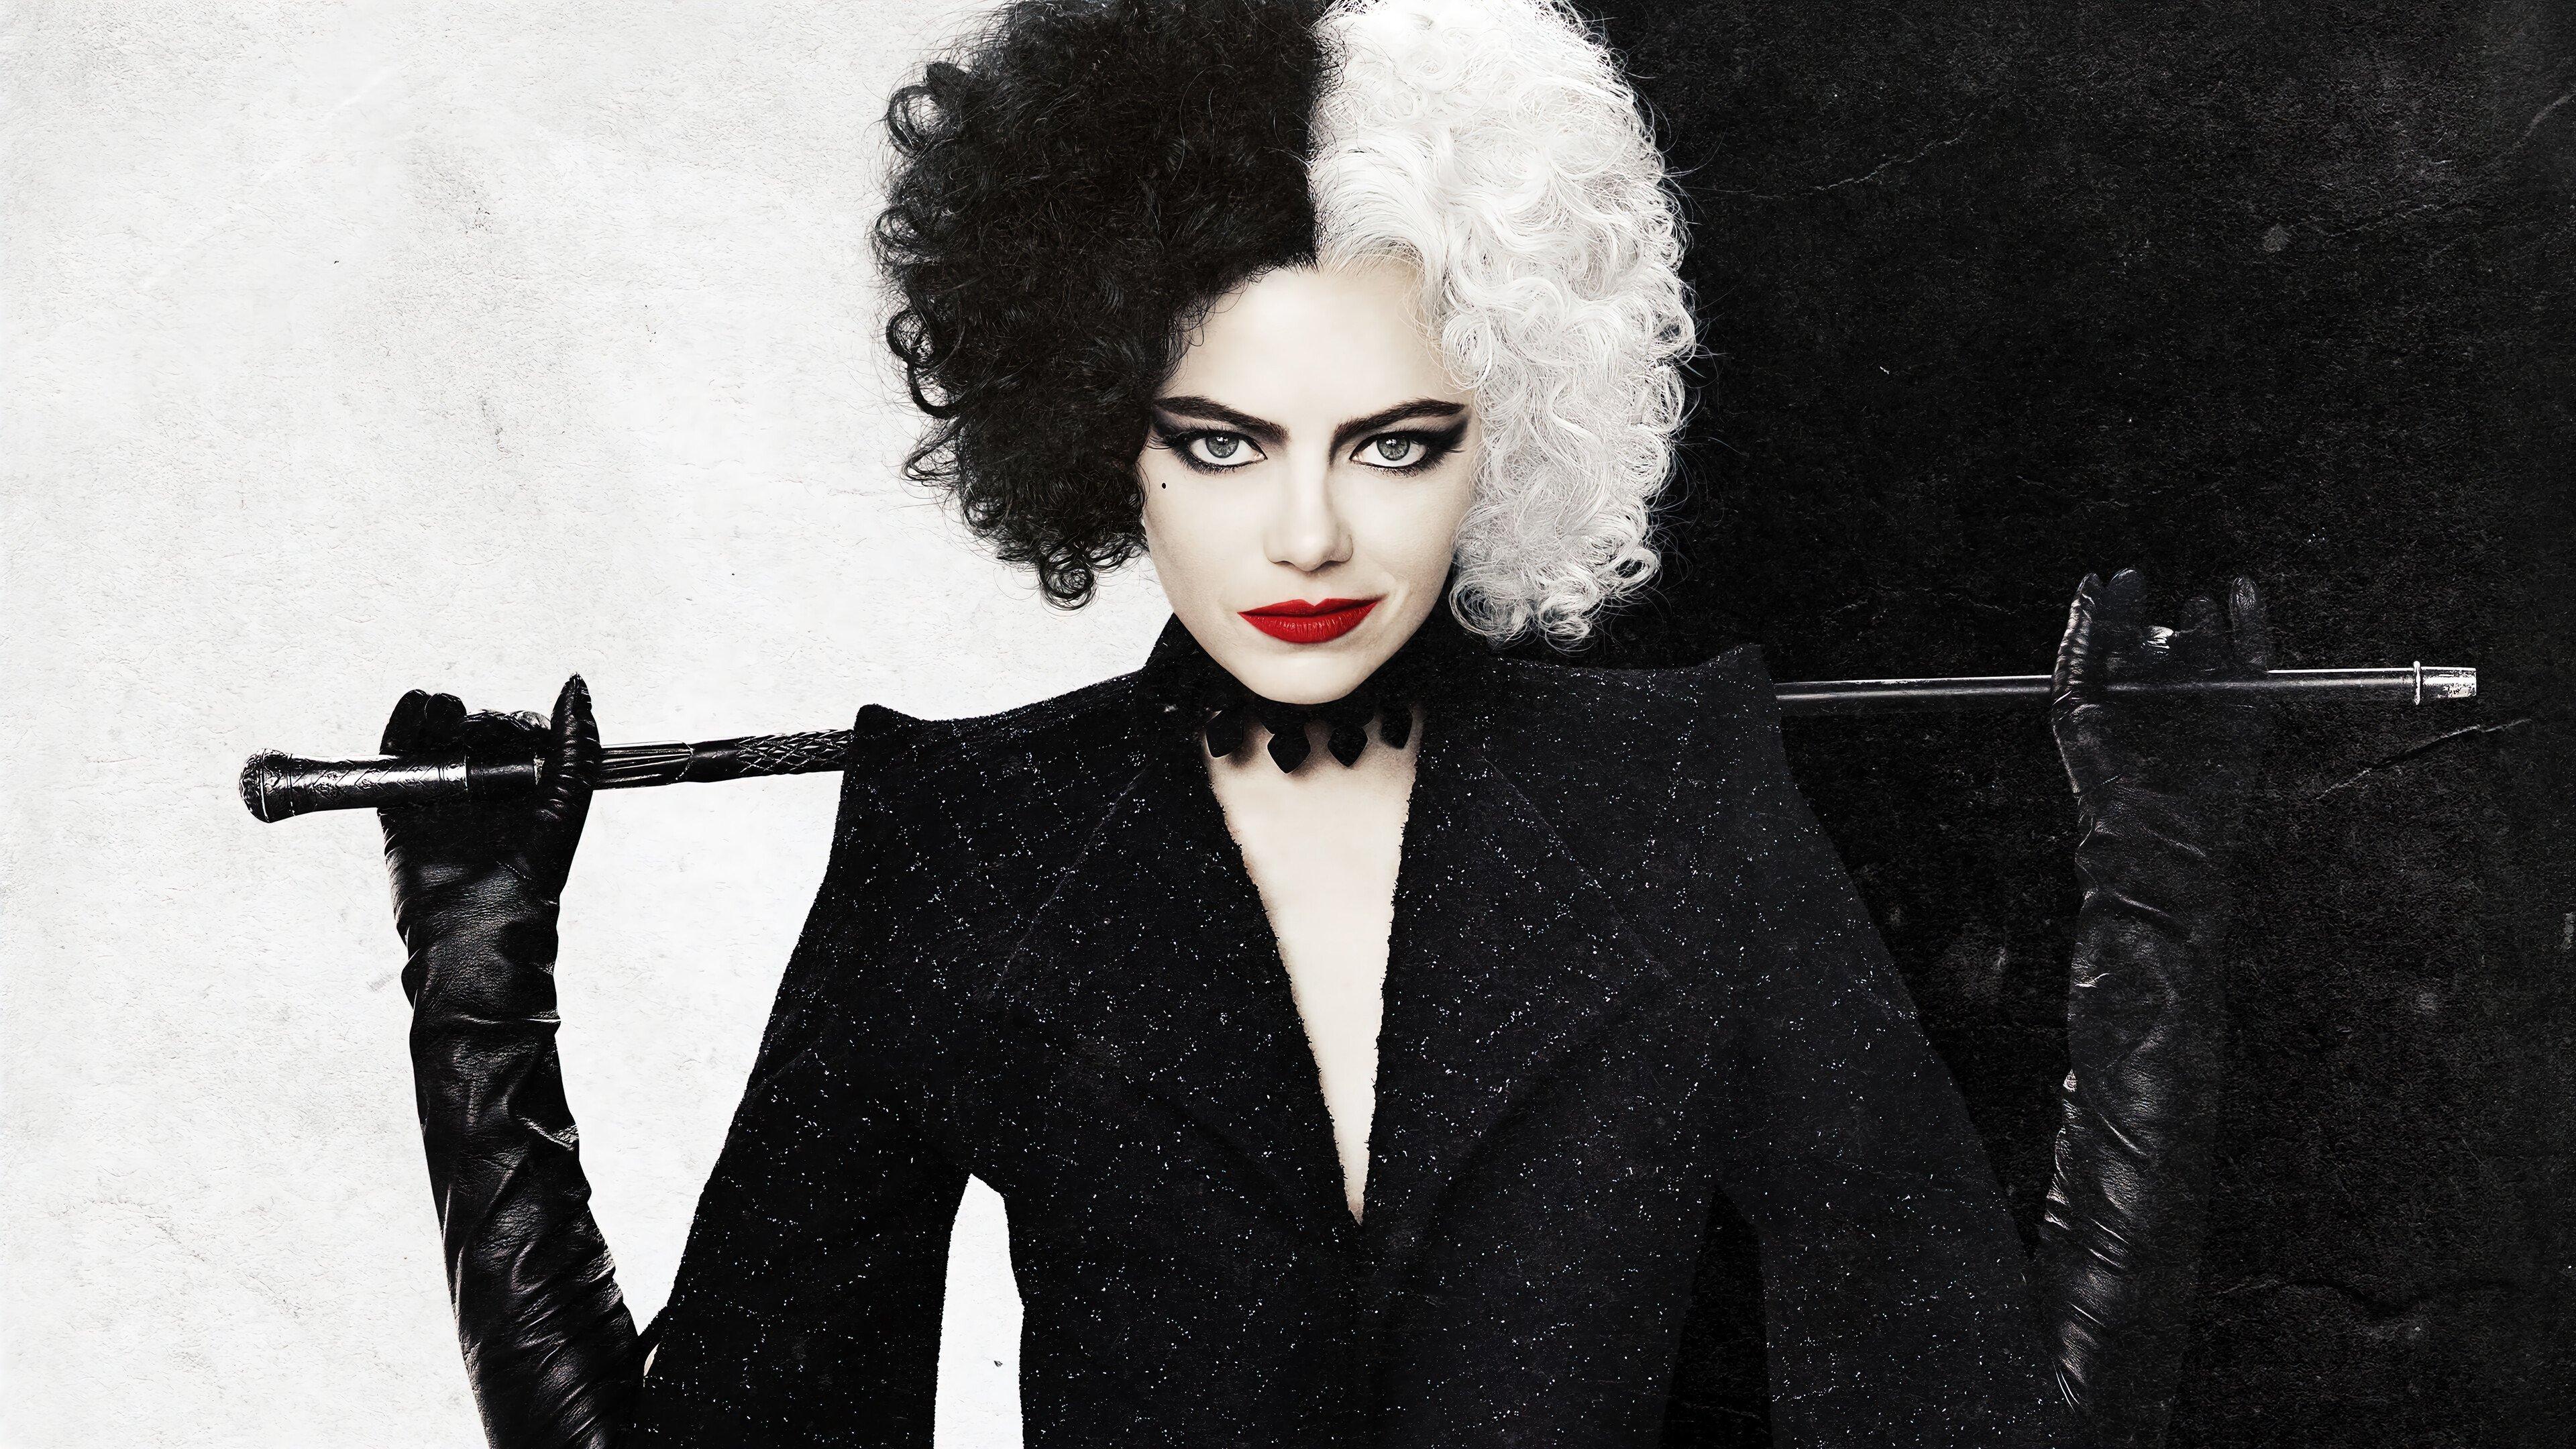 Fondos de pantalla Emma Stone como Cruella